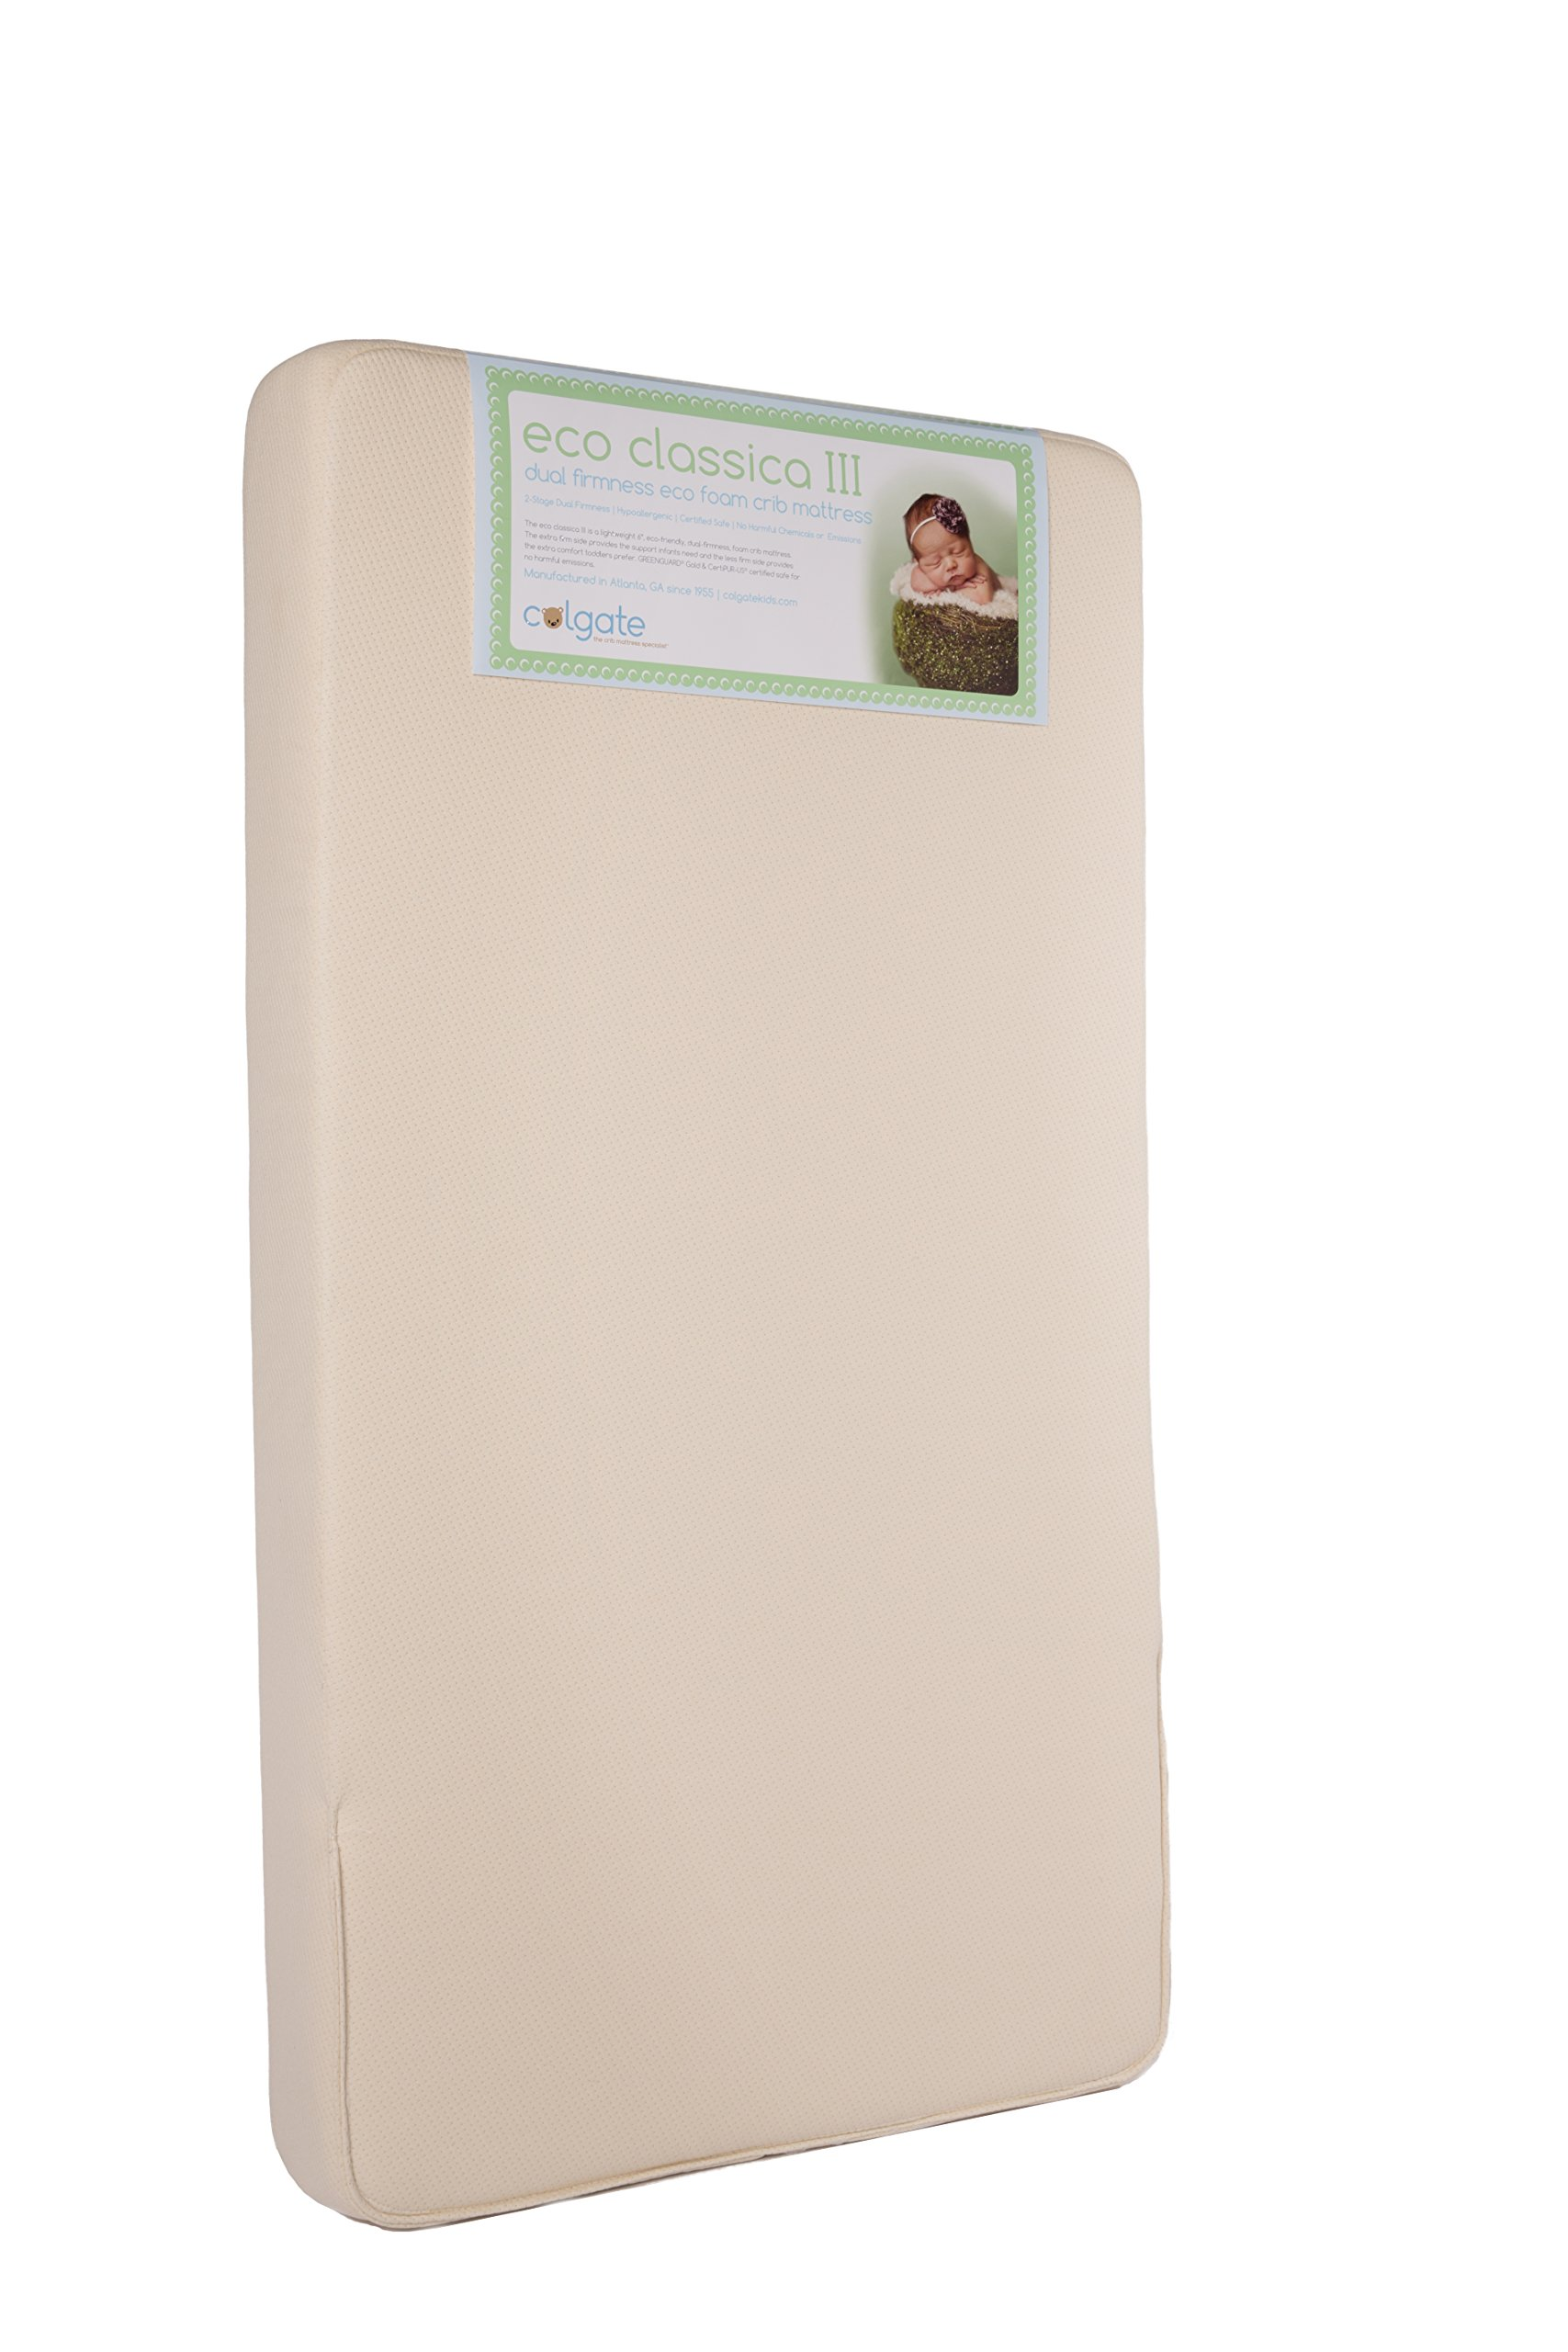 Colgate Eco Classica III Dual firmness Eco-Friendlier Crib mattress, Organic Cotton Cover product